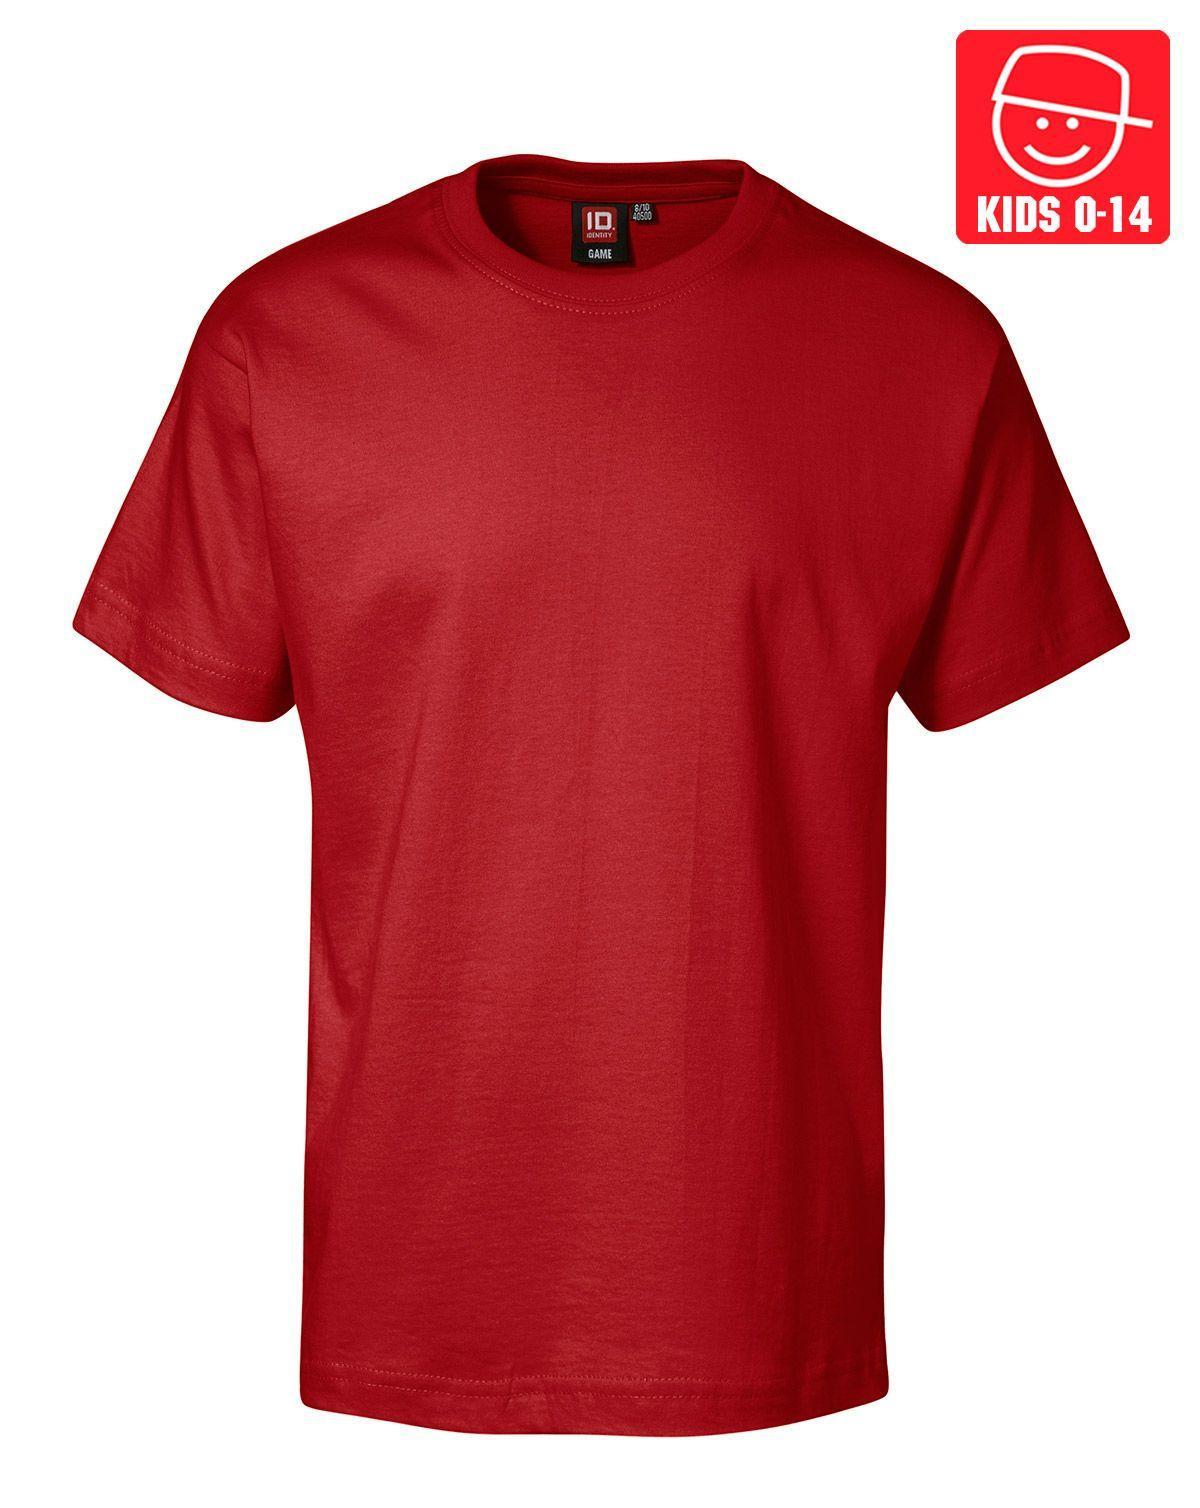 Image of   ID T-shirts (Rød, 116)